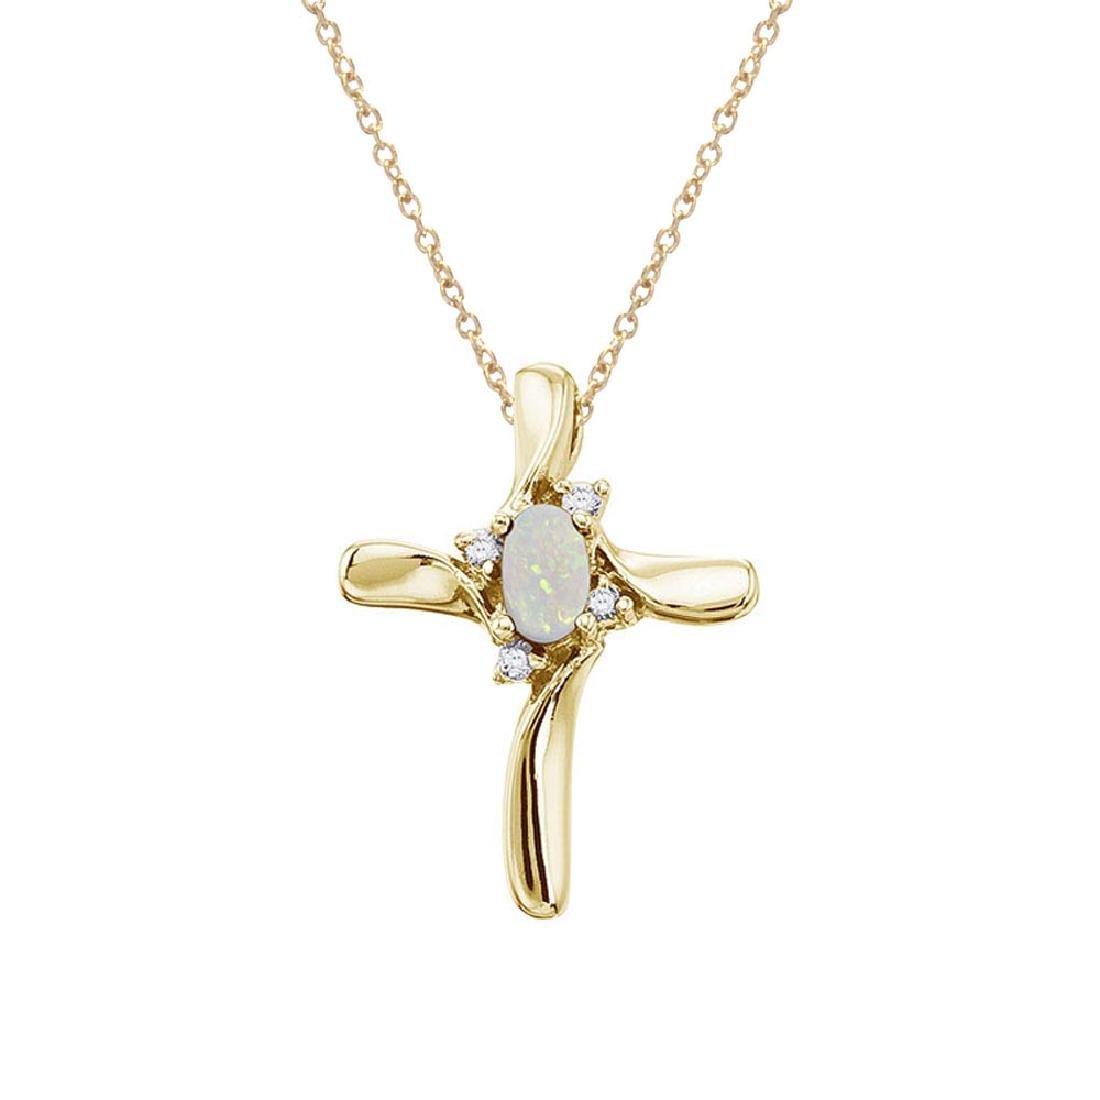 Certified 14K Yellow Gold Opal and Diamond Cross Pendan